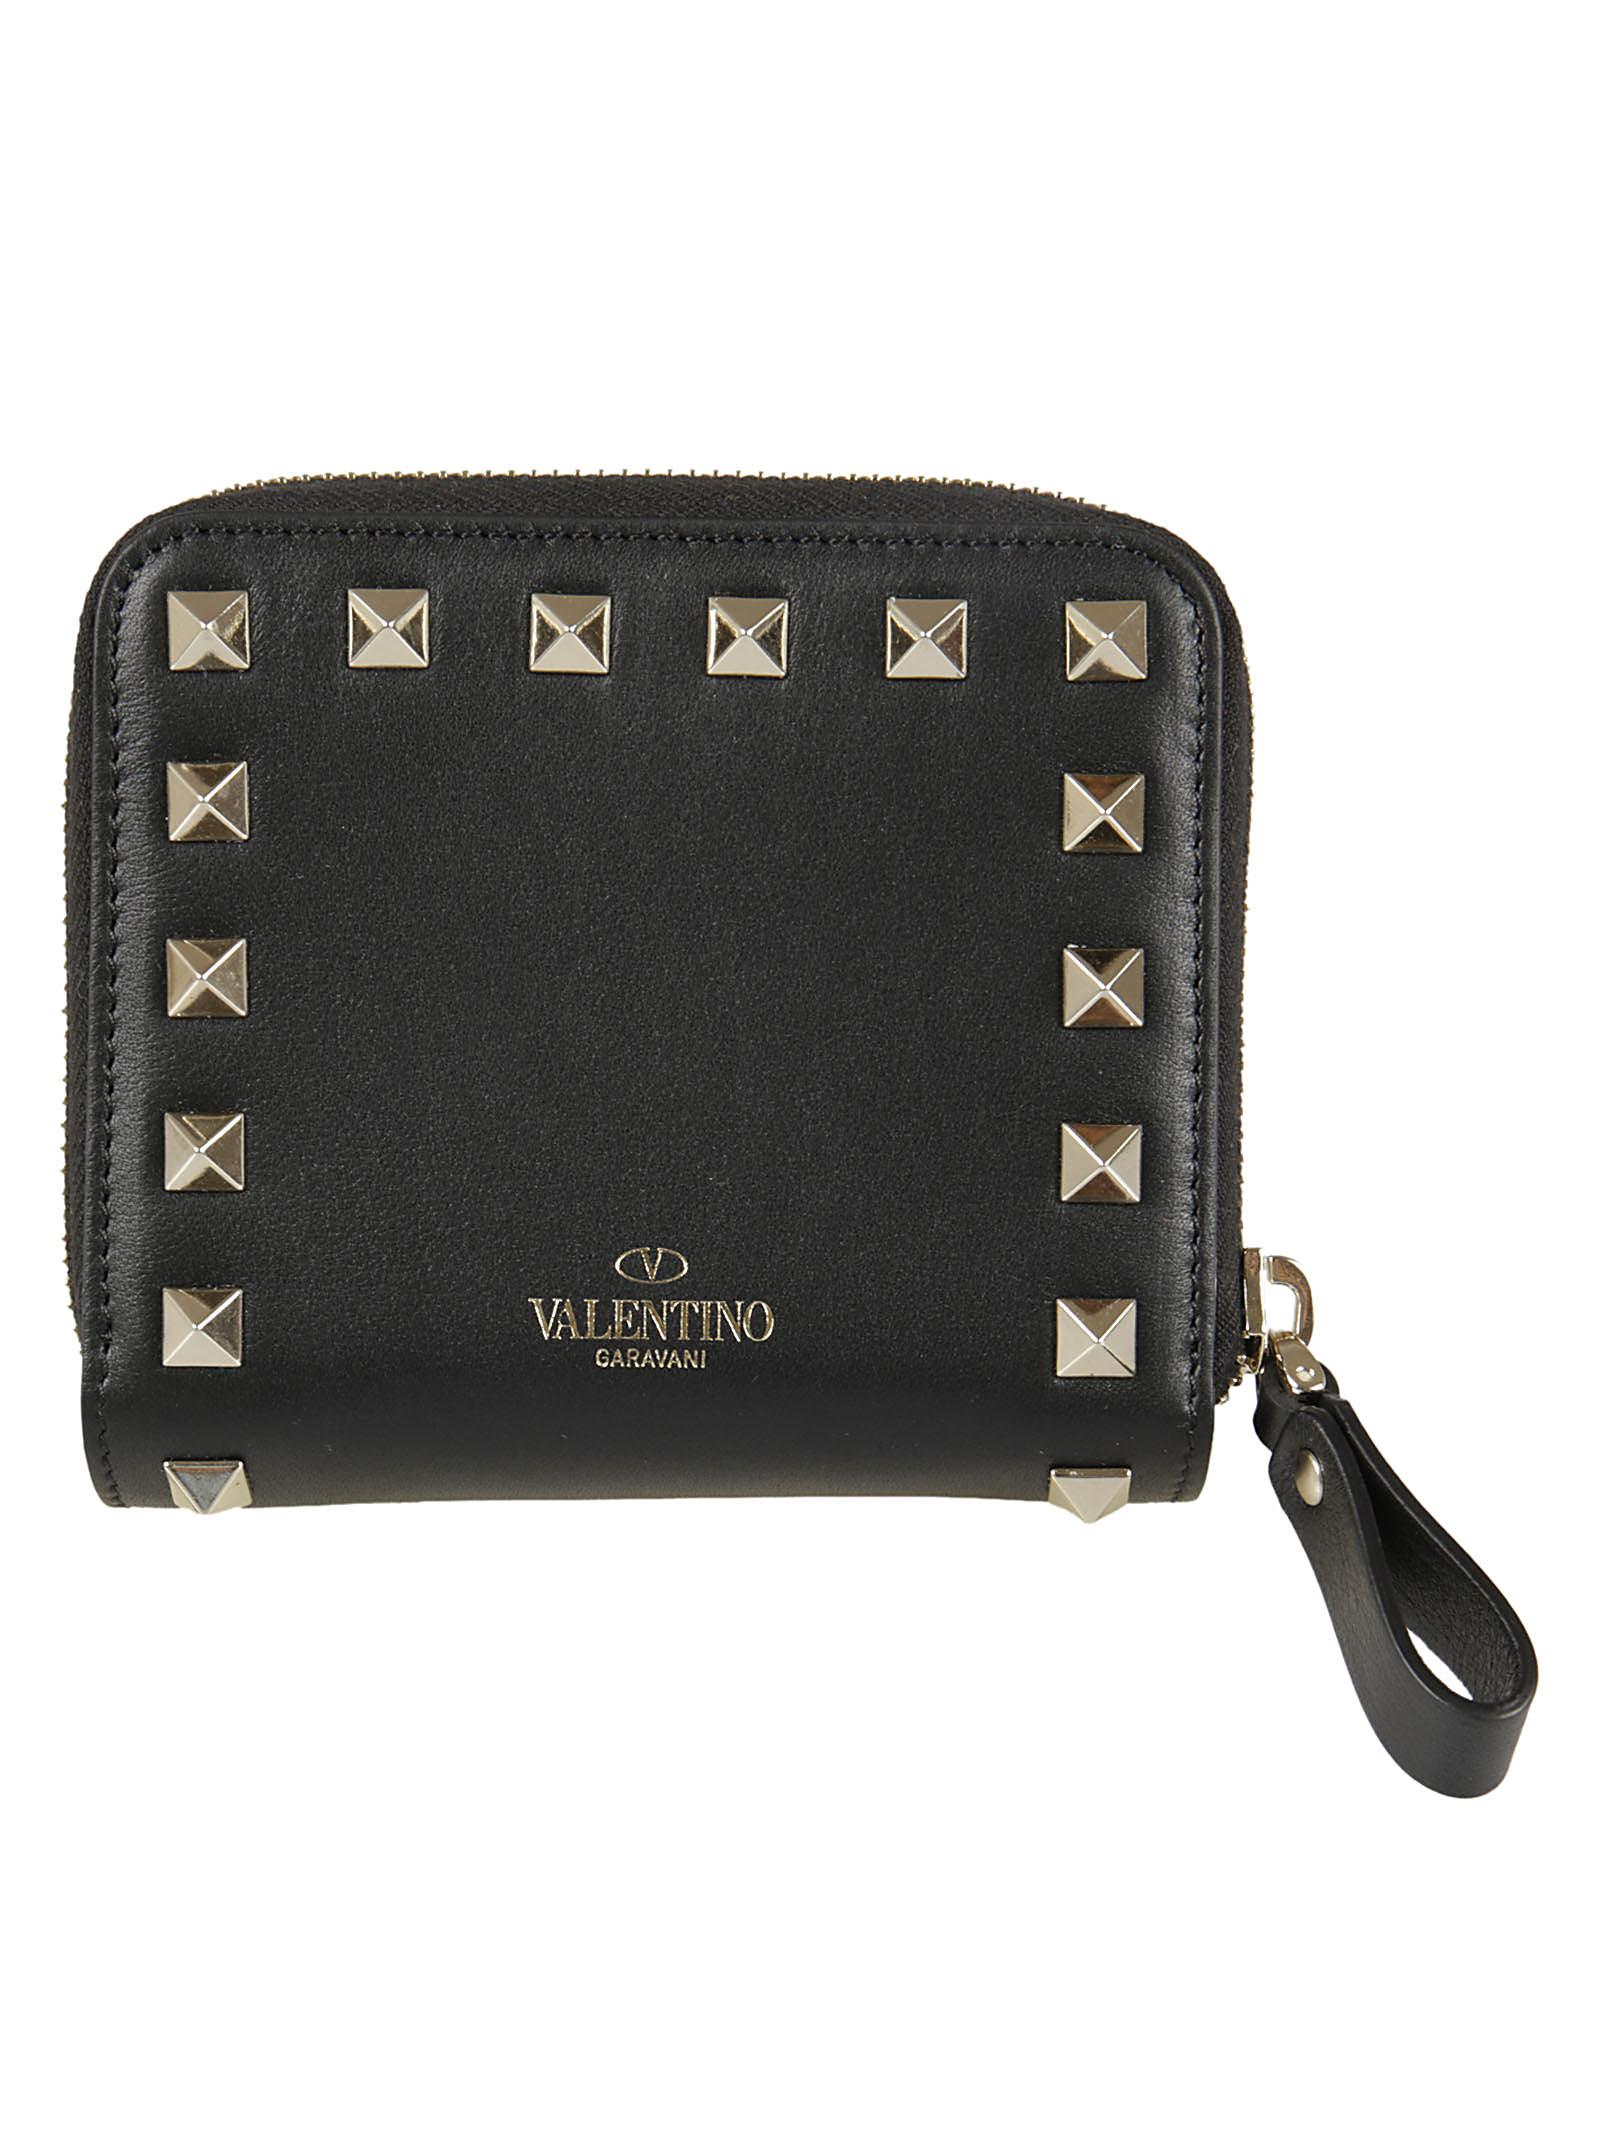 Valentino Garavani Valentino Garavani Rockstud Wallet